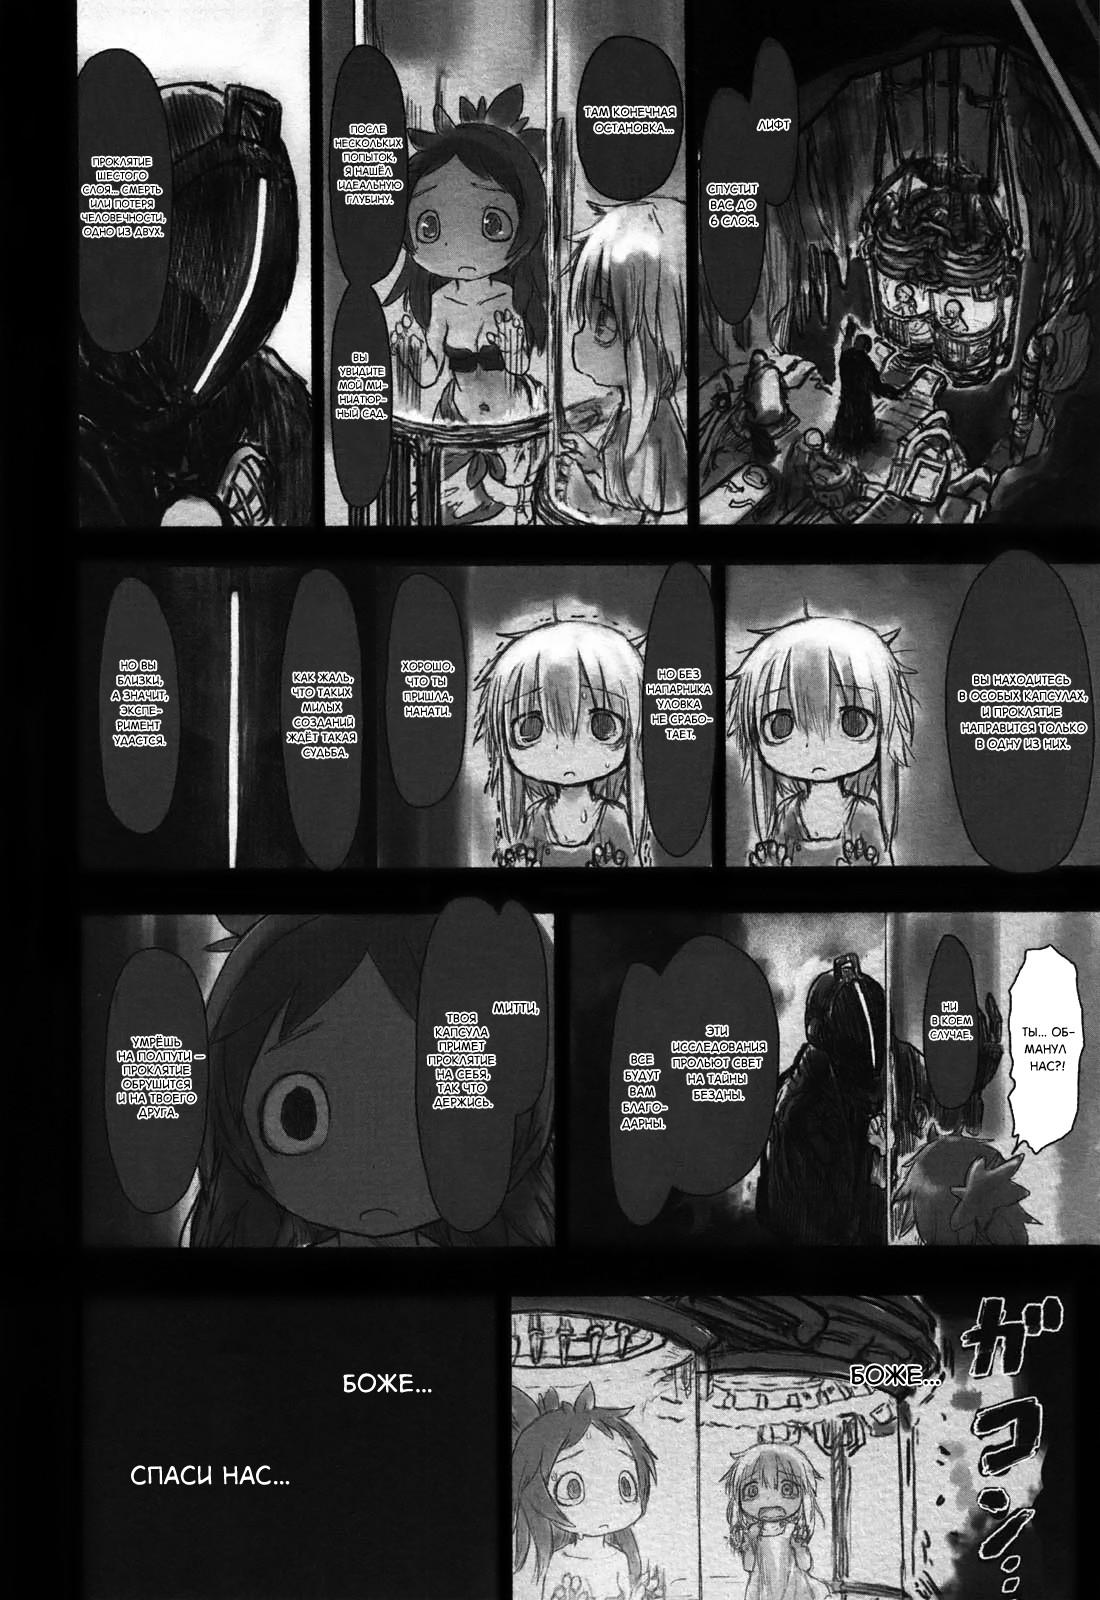 https://r1.ninemanga.com/comics/pic2/54/32566/389376/1513634757781.jpg Page 8